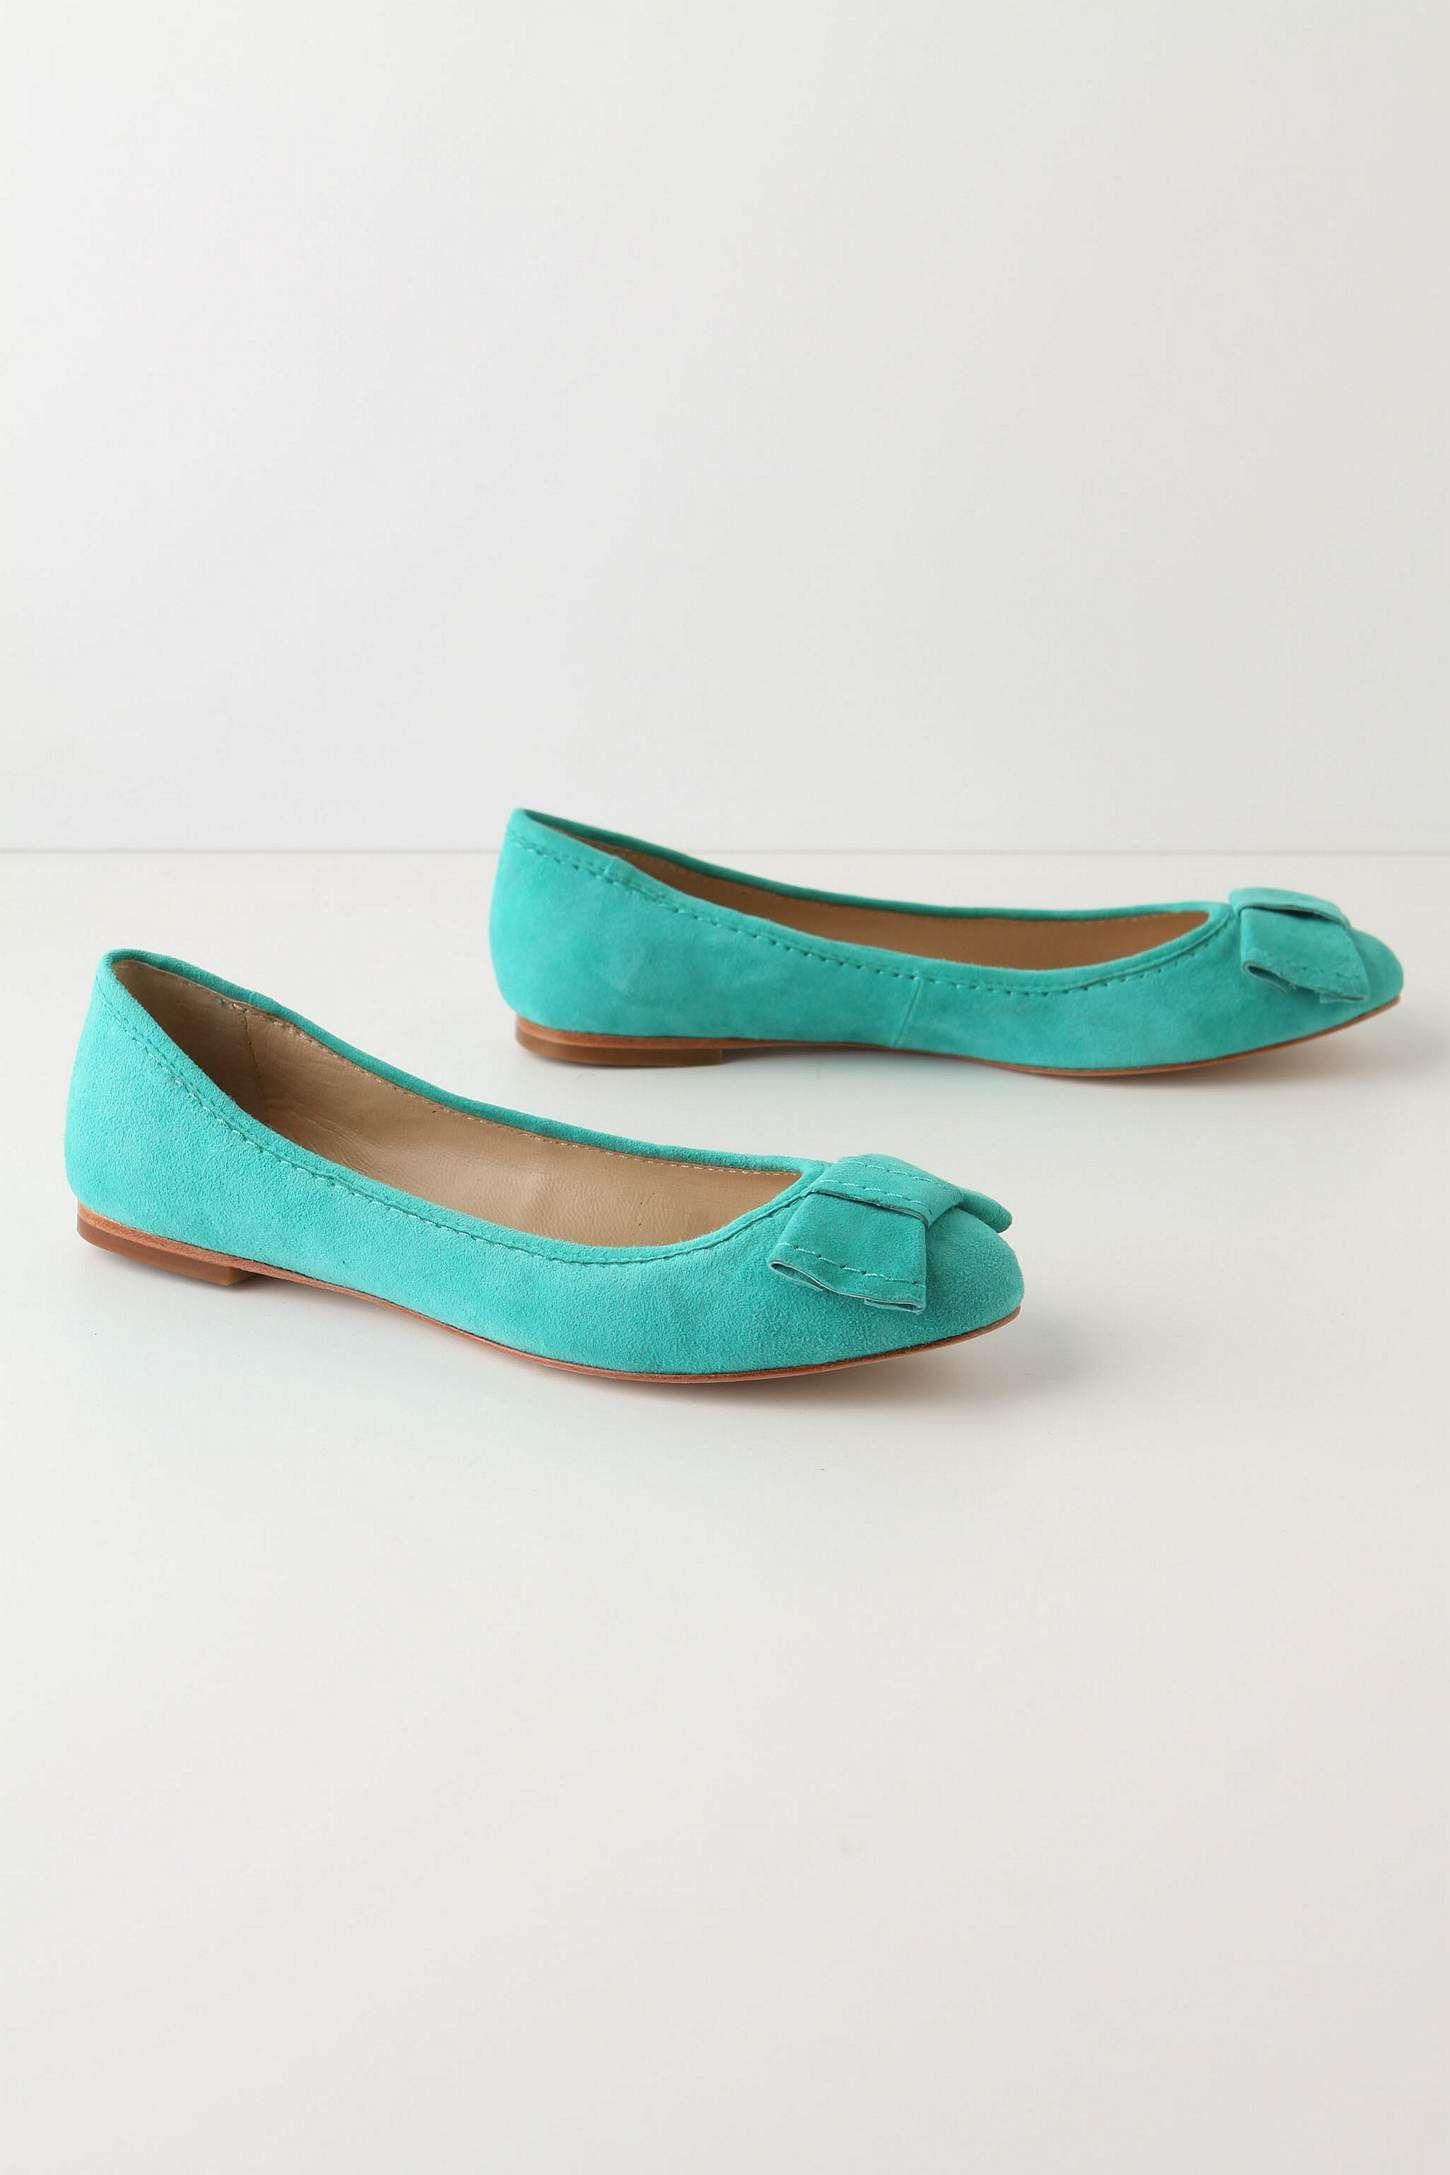 Make Fast Flats in Tiffany blue by Anthropologie (via strawberry heels forever http://strawberryheelsforever.blogspot.com/2011/04/what-im-loving-yellow.html) $108